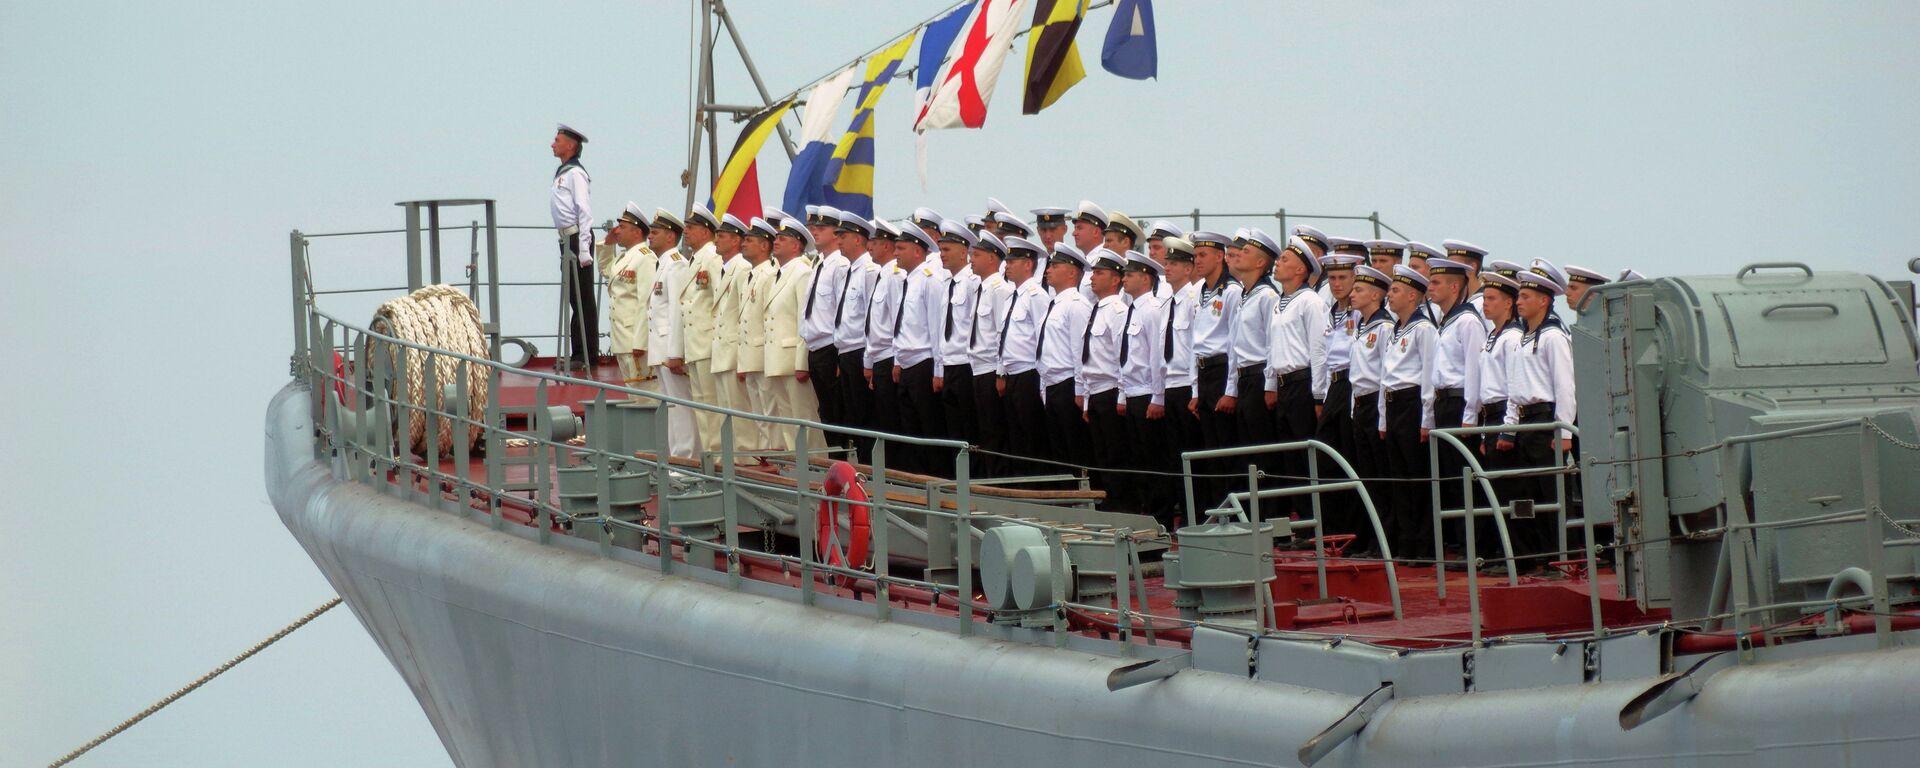 Rosyjska flota na morzu Czarnym - Sputnik Polska, 1920, 01.08.2021